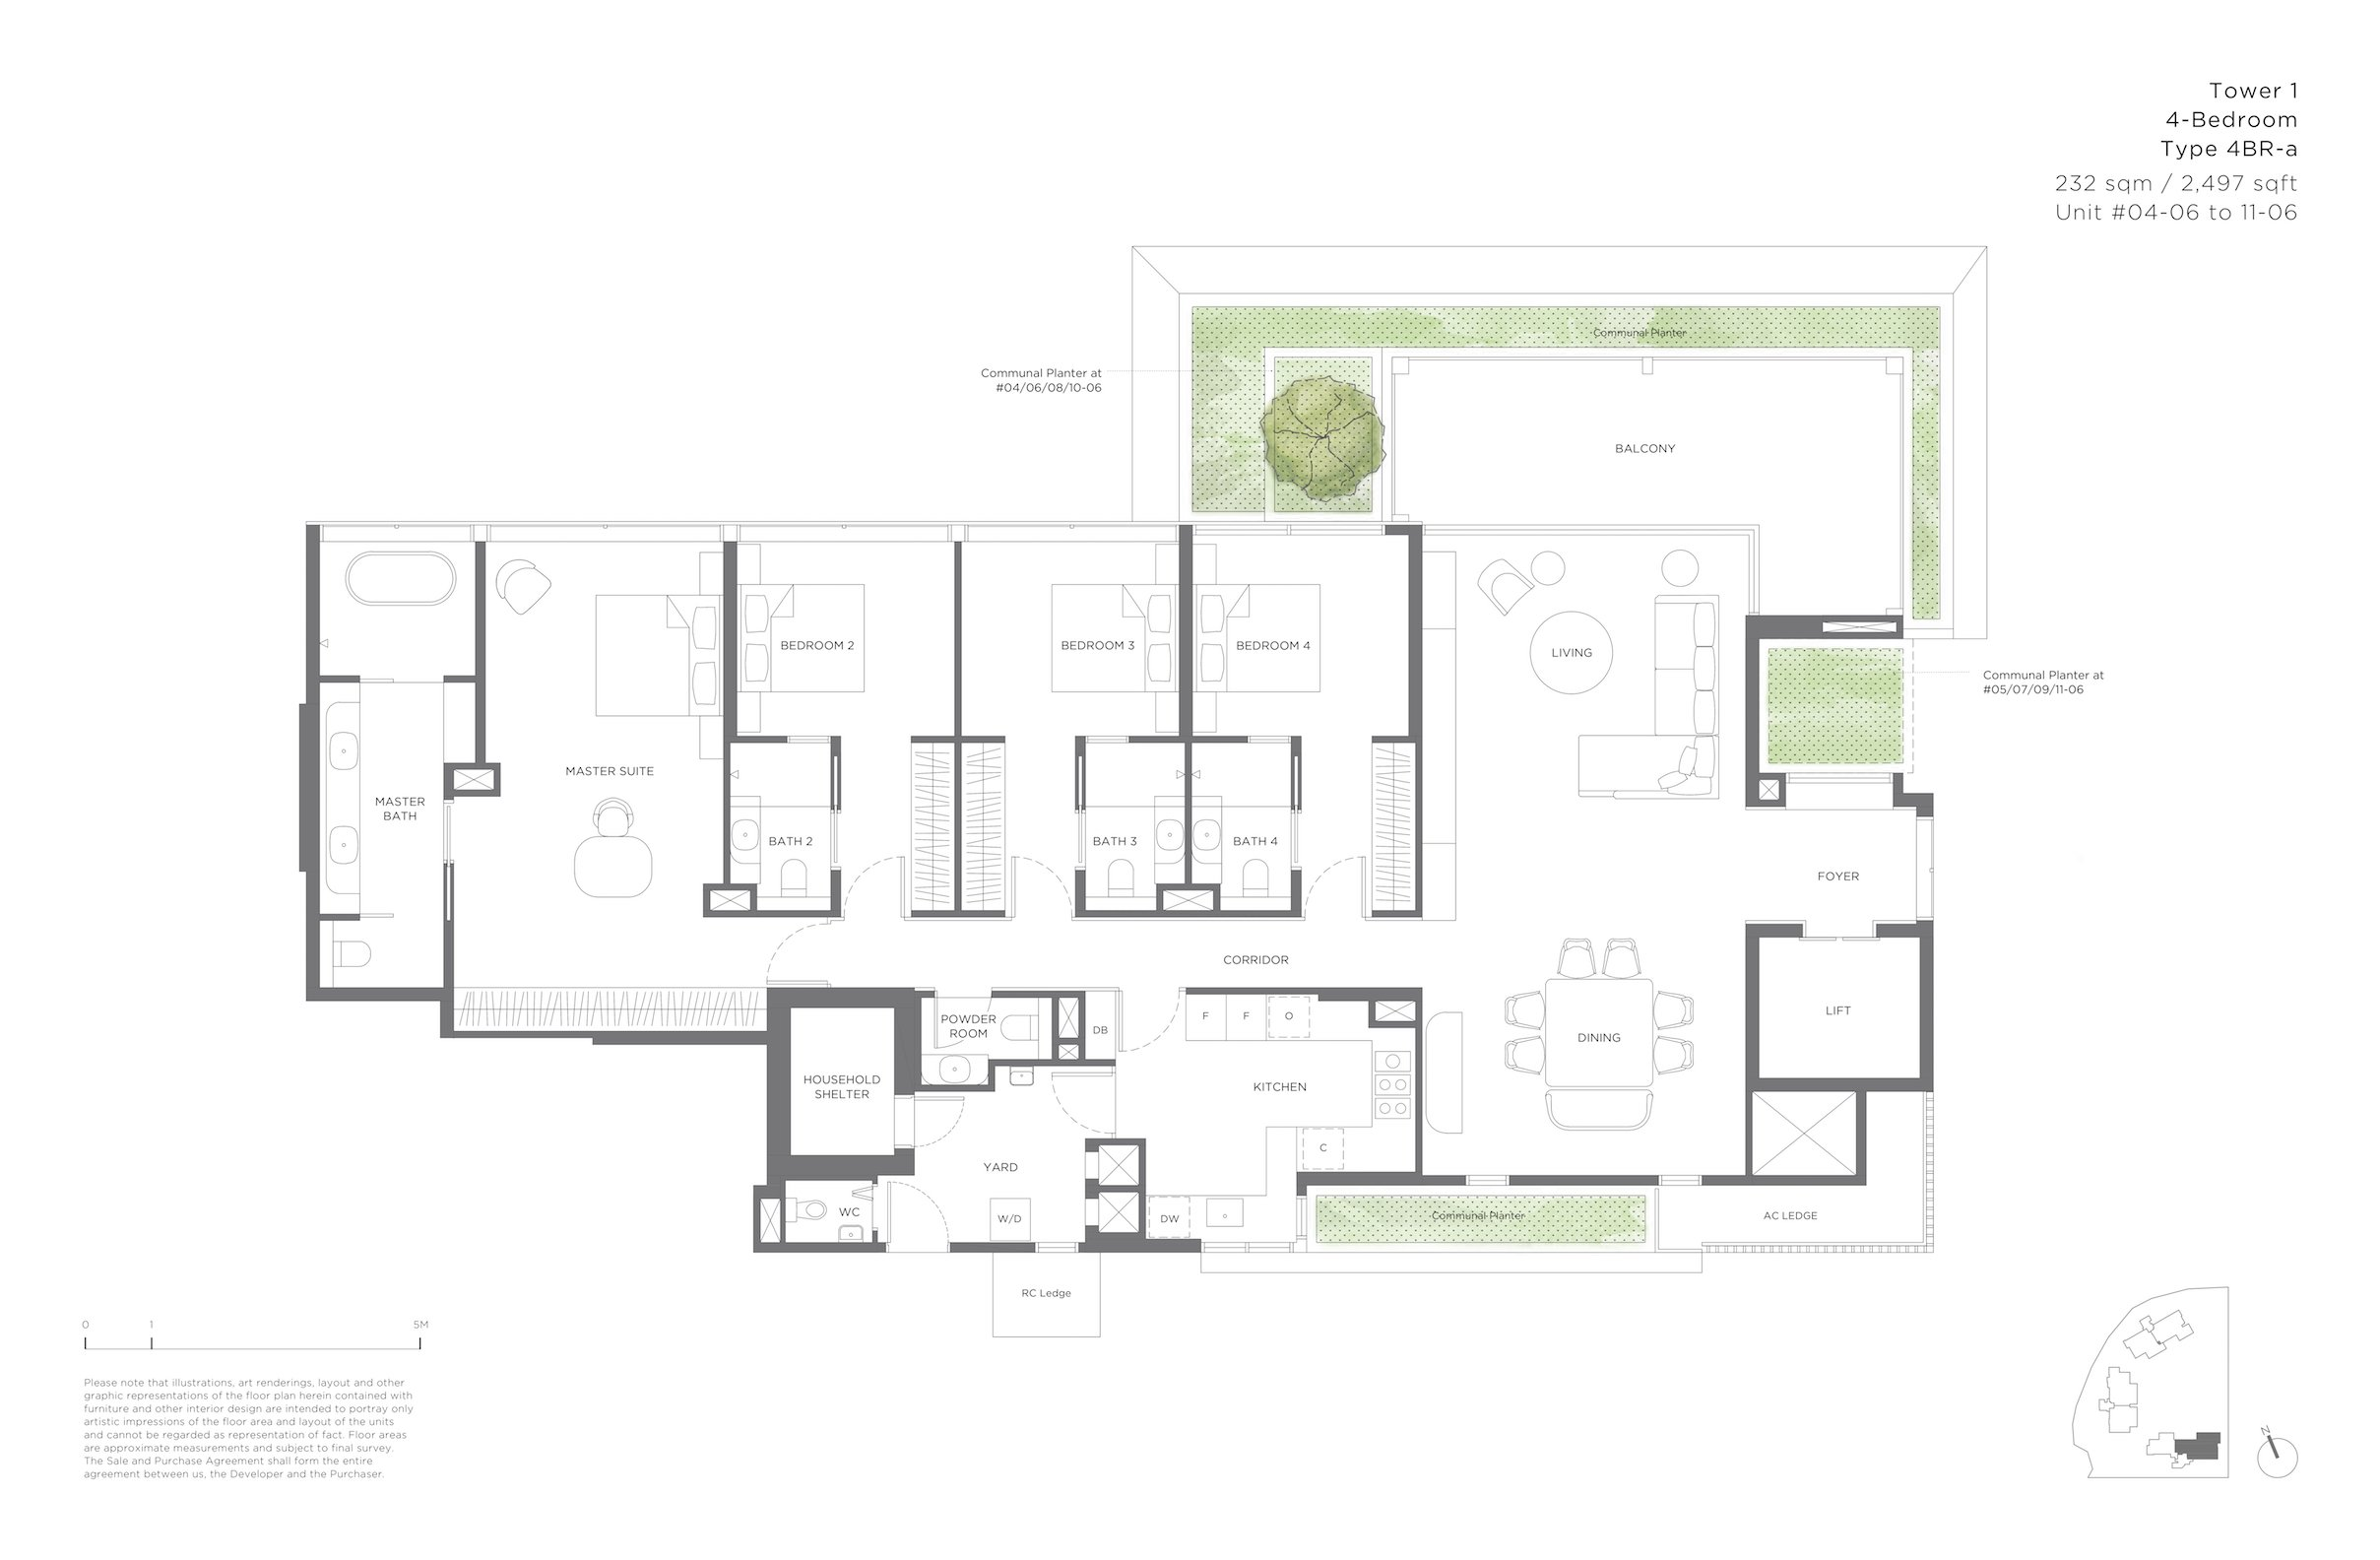 15 Holland Hill 荷兰山公寓 4-bedroom 4br-a